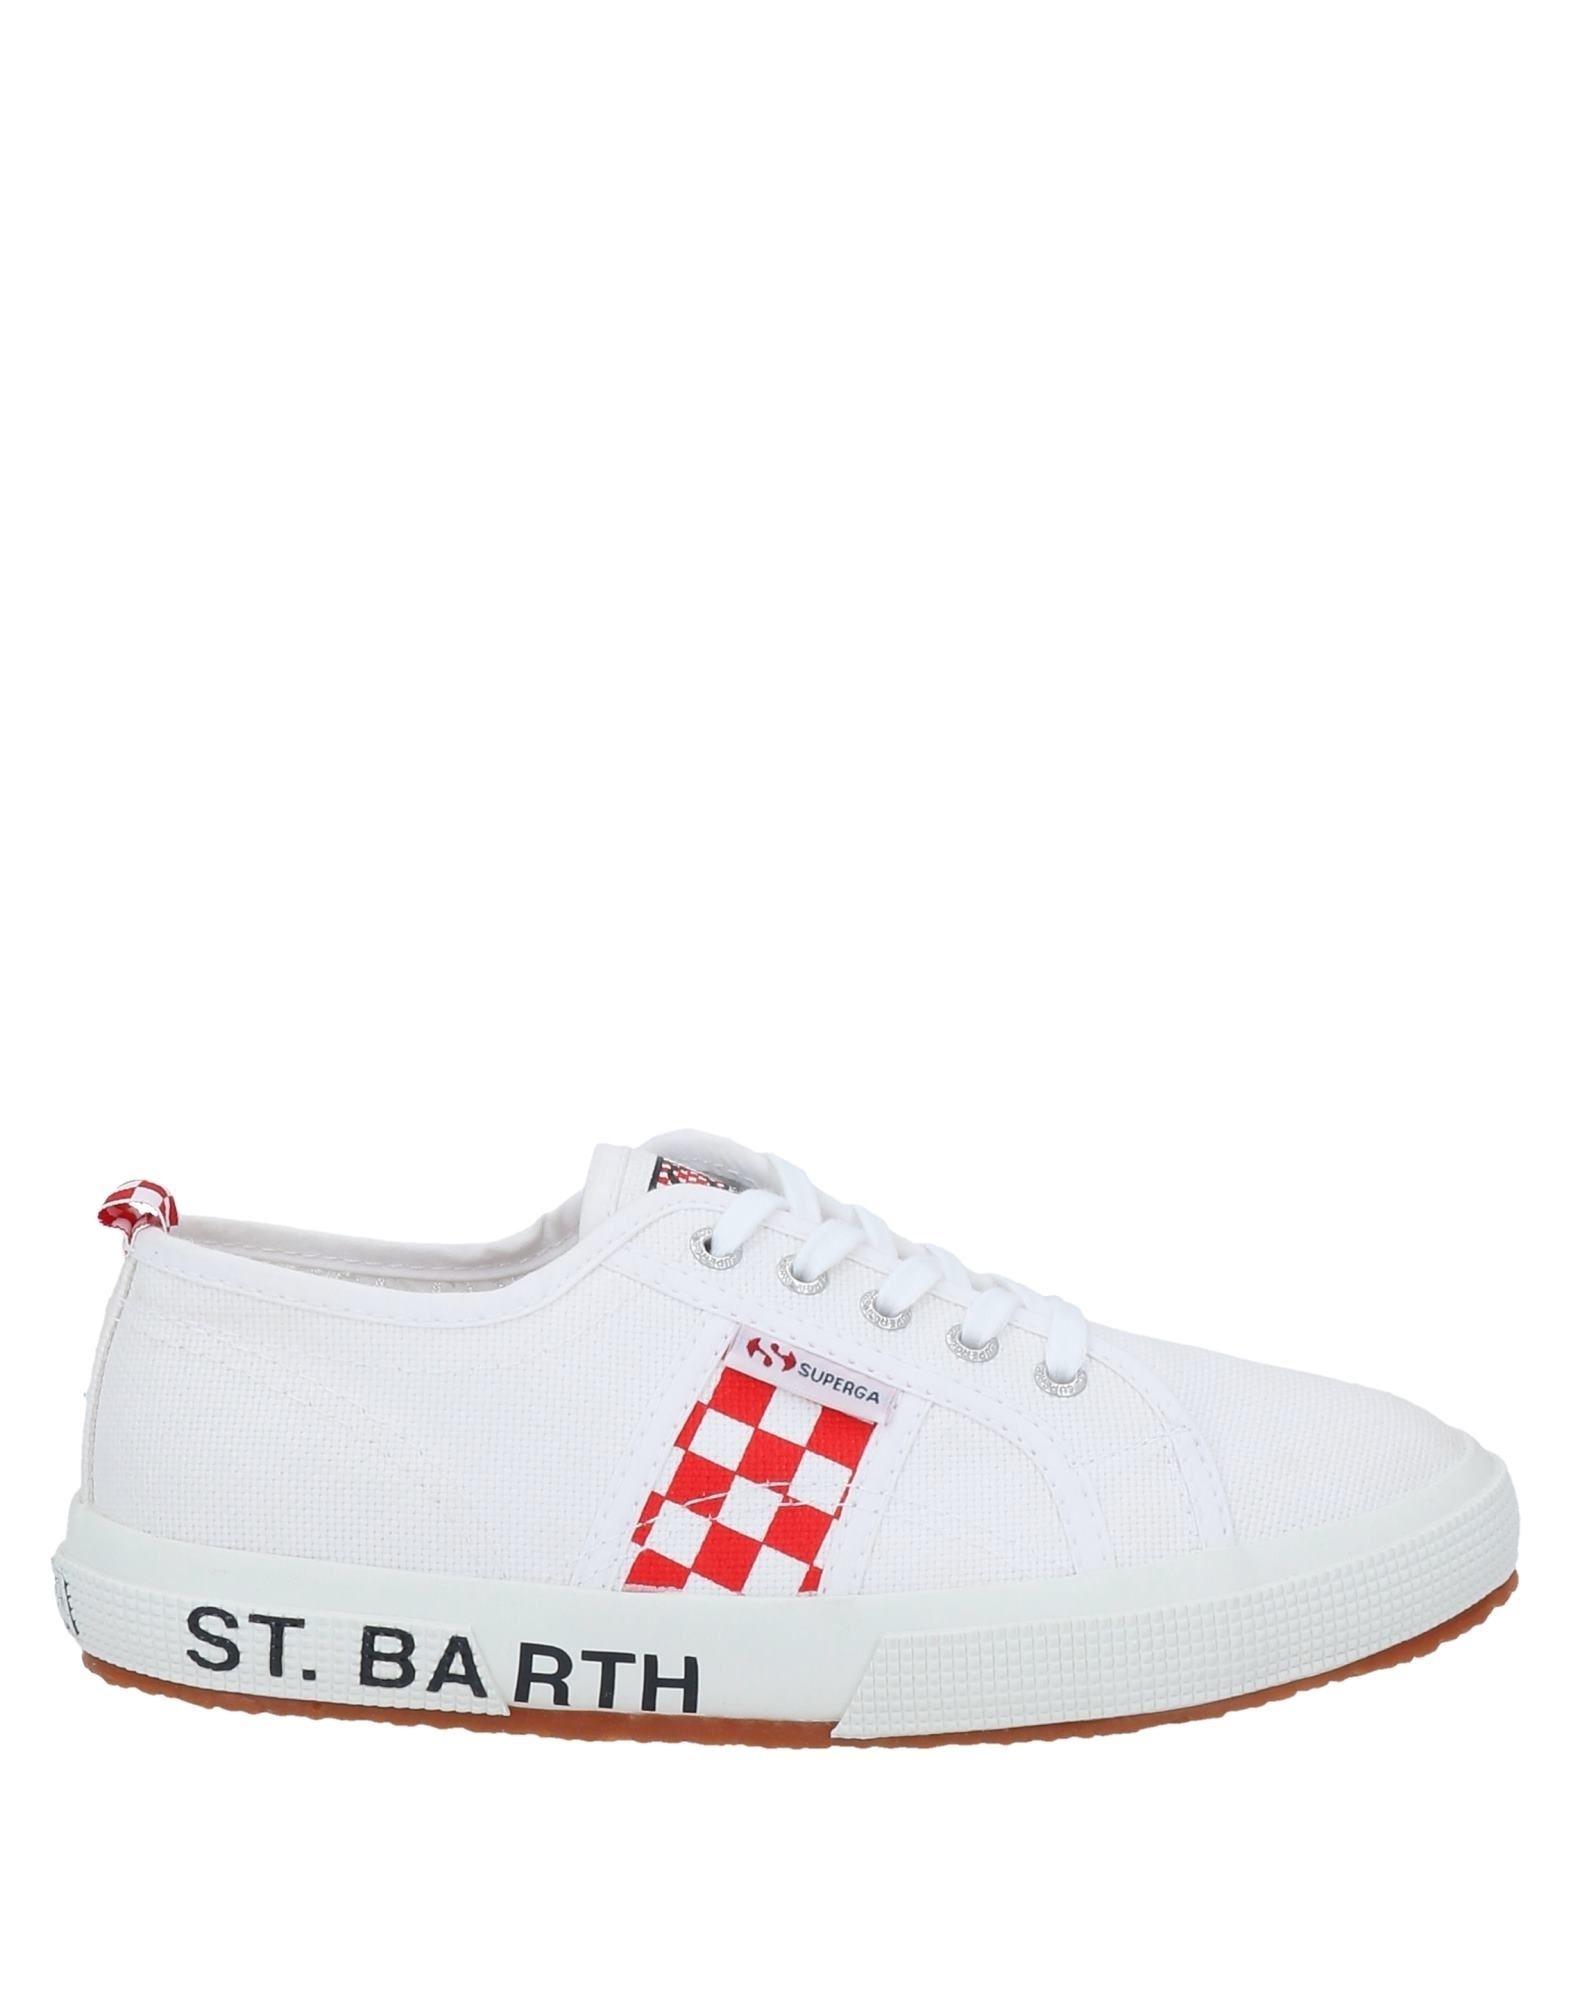 SUPERGA x MC2 SAINT BARTH Low-tops & sneakers - Item 17026932